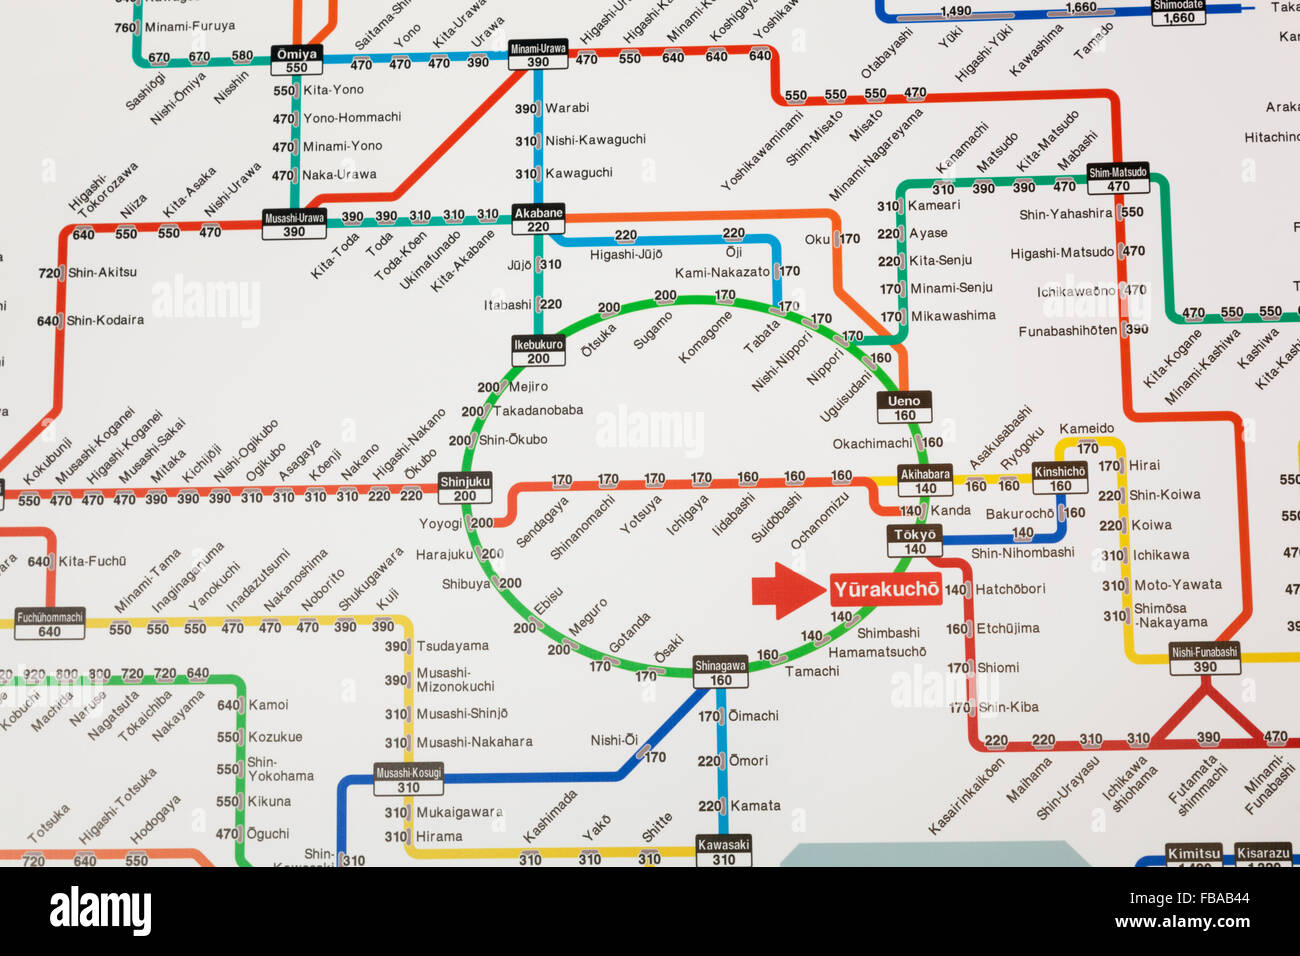 Japan Honshu Tokyo Tokyo Train System Map Stock Photo Royalty - Japan map honshu